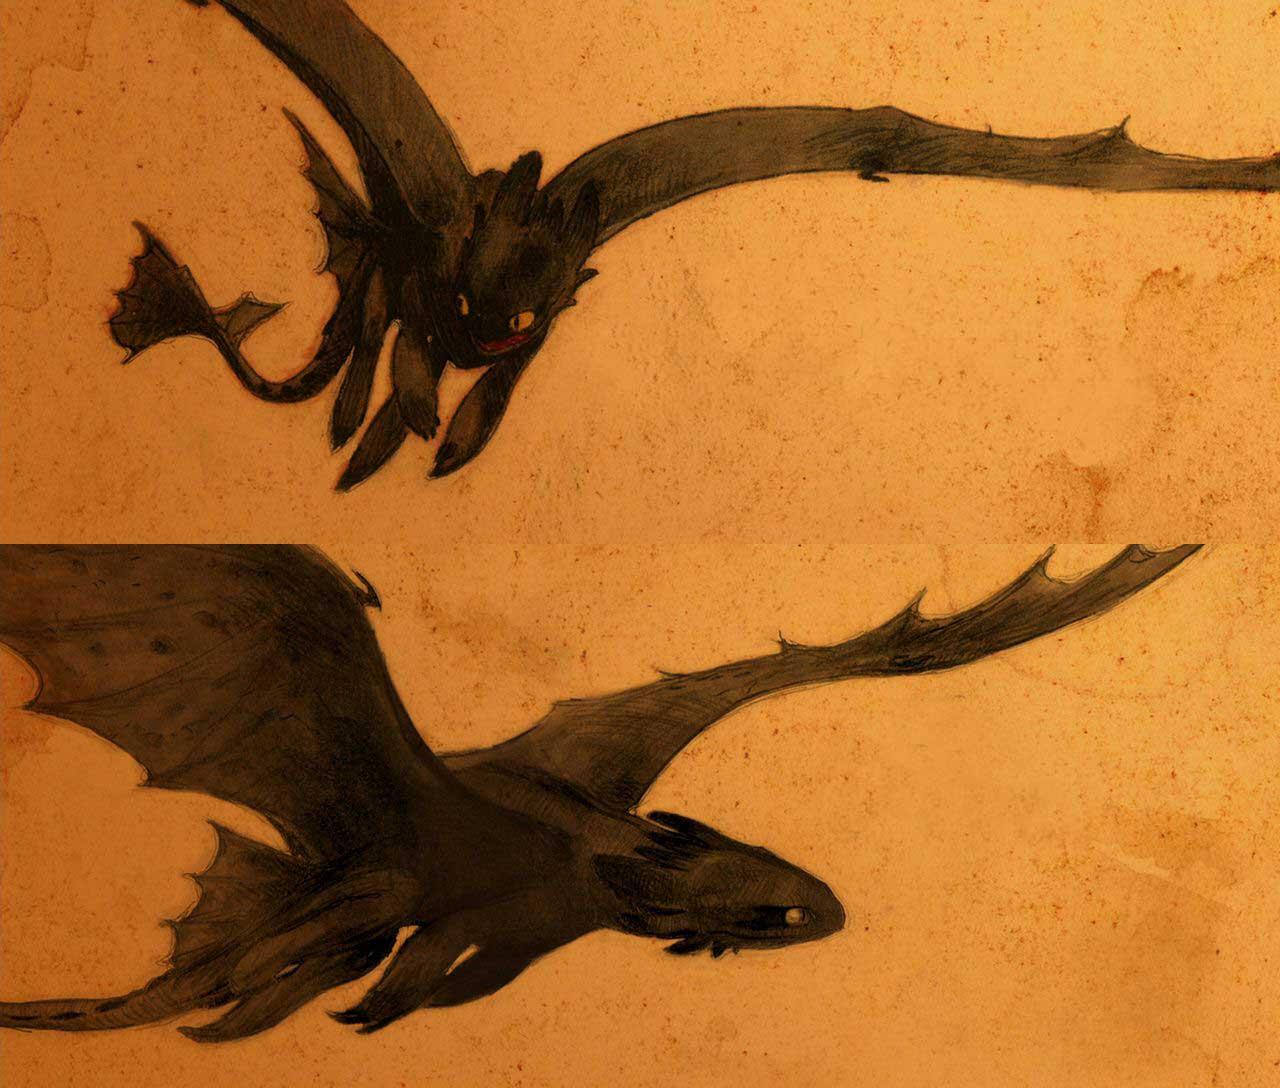 Night fury dragon clipart.